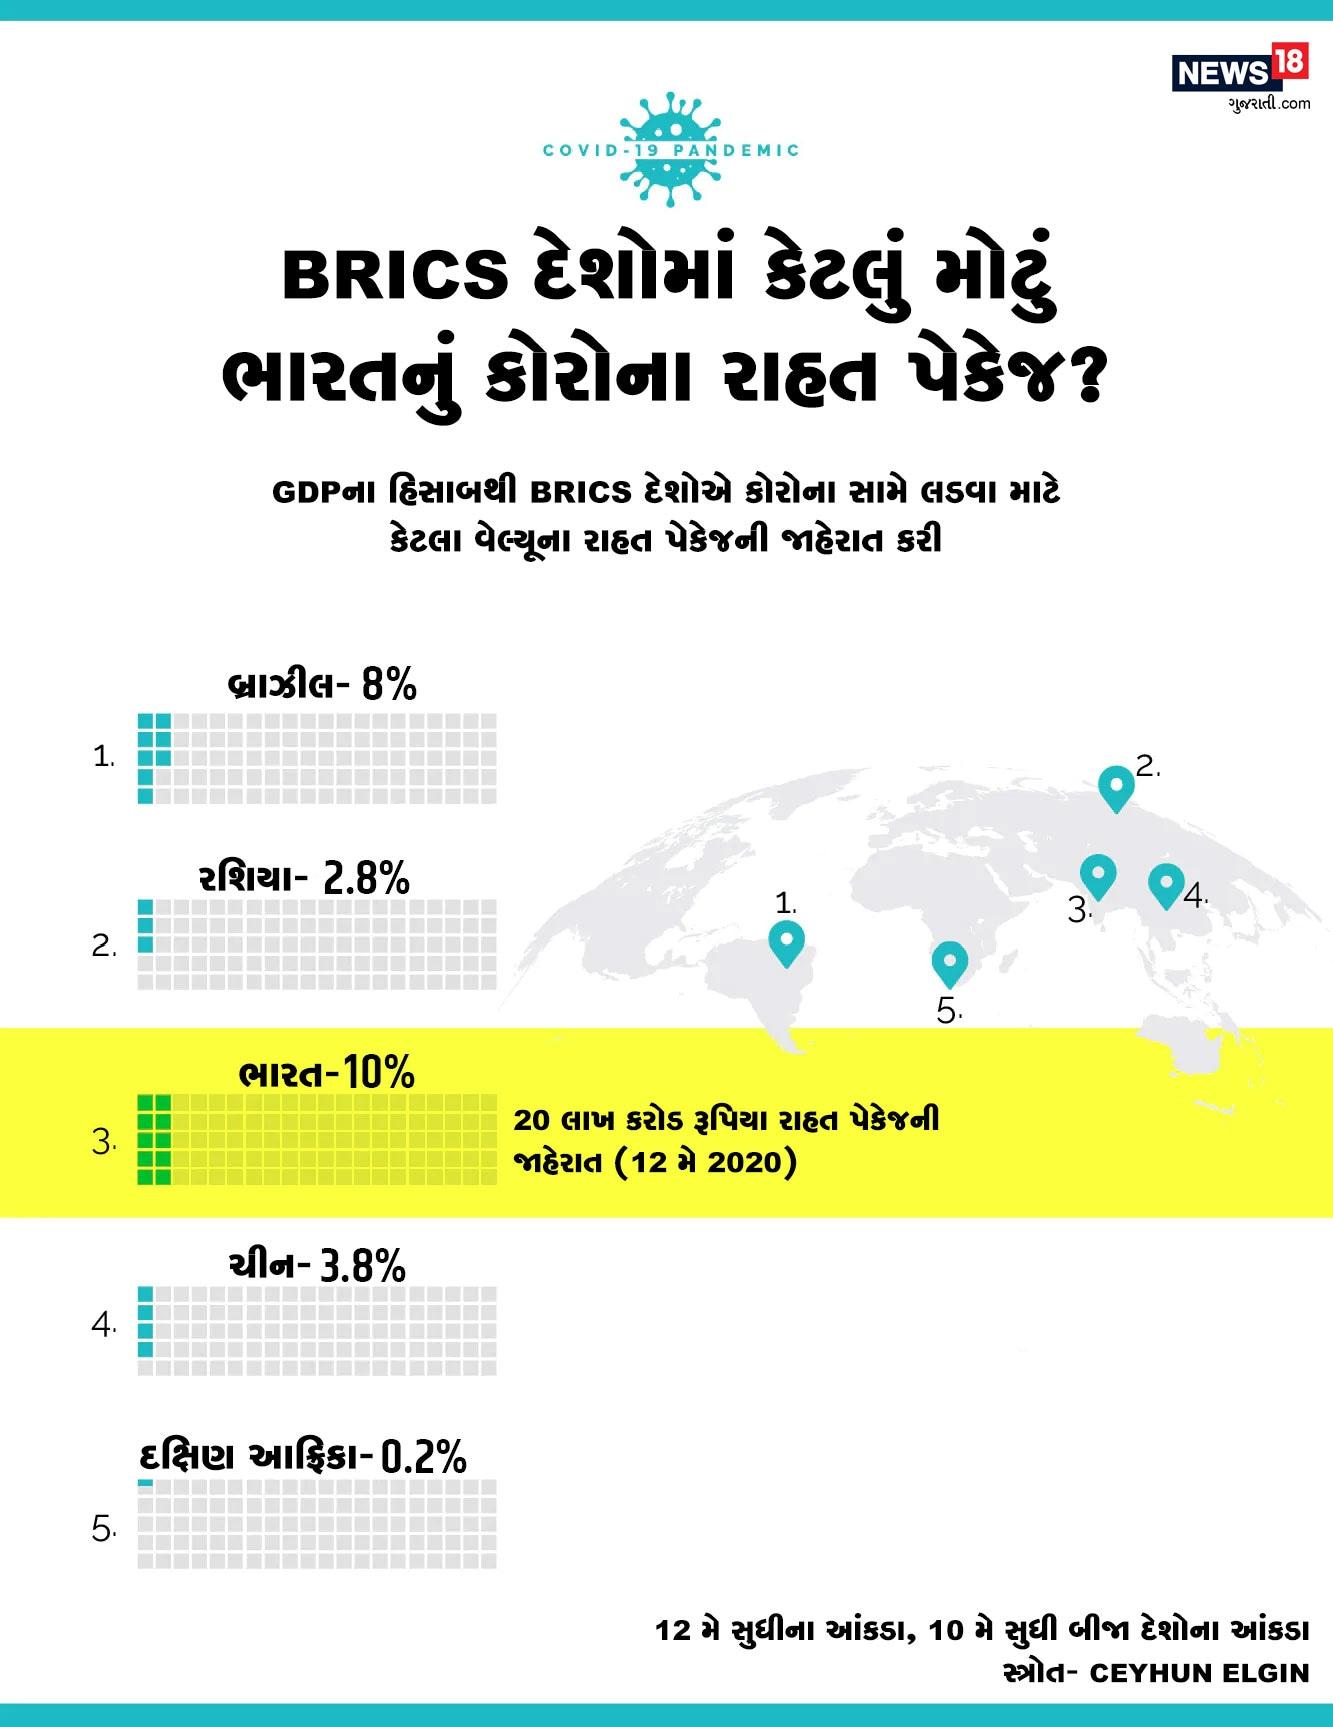 BRICS દેશોની તુલના કરવામાં આવે તો ભારતે GDP હિસ્સેદારીના મામલે સંગઠનના બાકી દેશોથી વધુ પેકેજની જાહેરાત કરી છે.